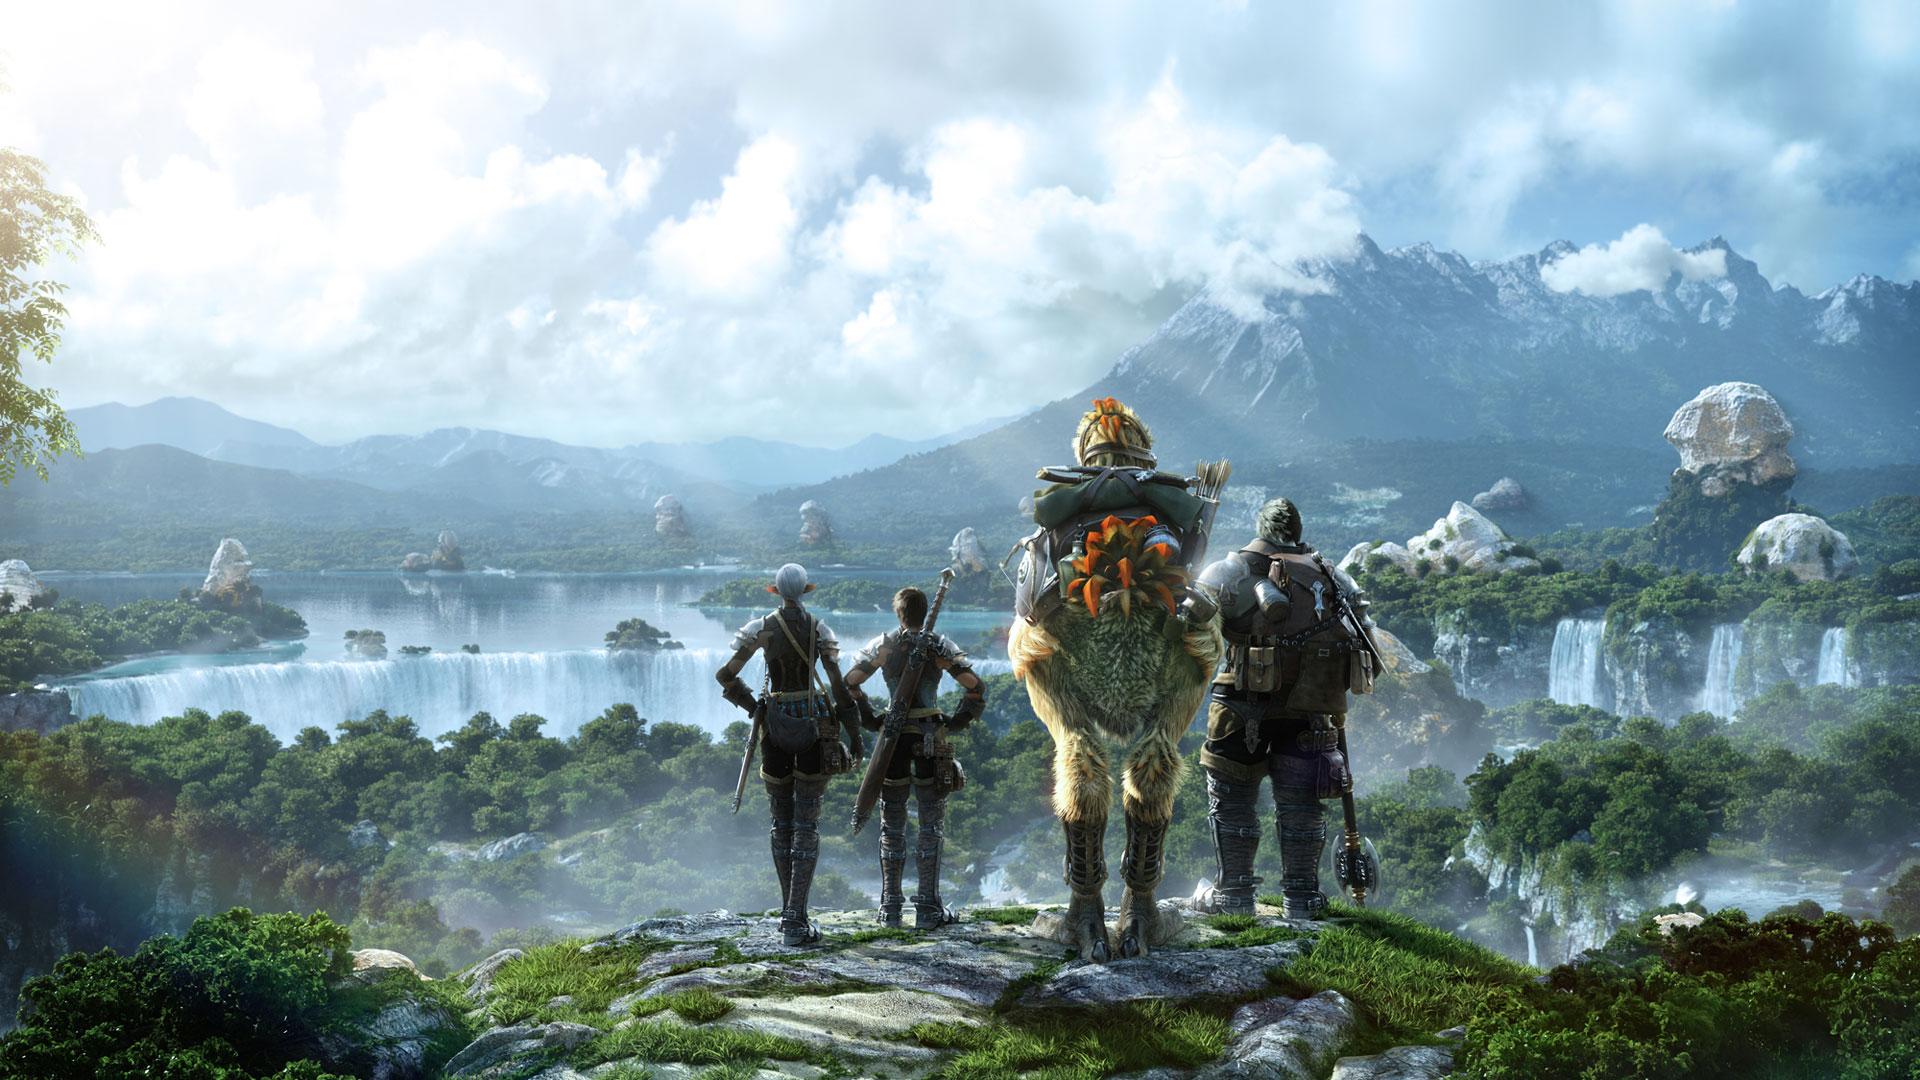 Naoki Yoshida از عملکرد Final Fantasy XIV در سال ۲۰۱۷ و برنامههای آینده میگوید